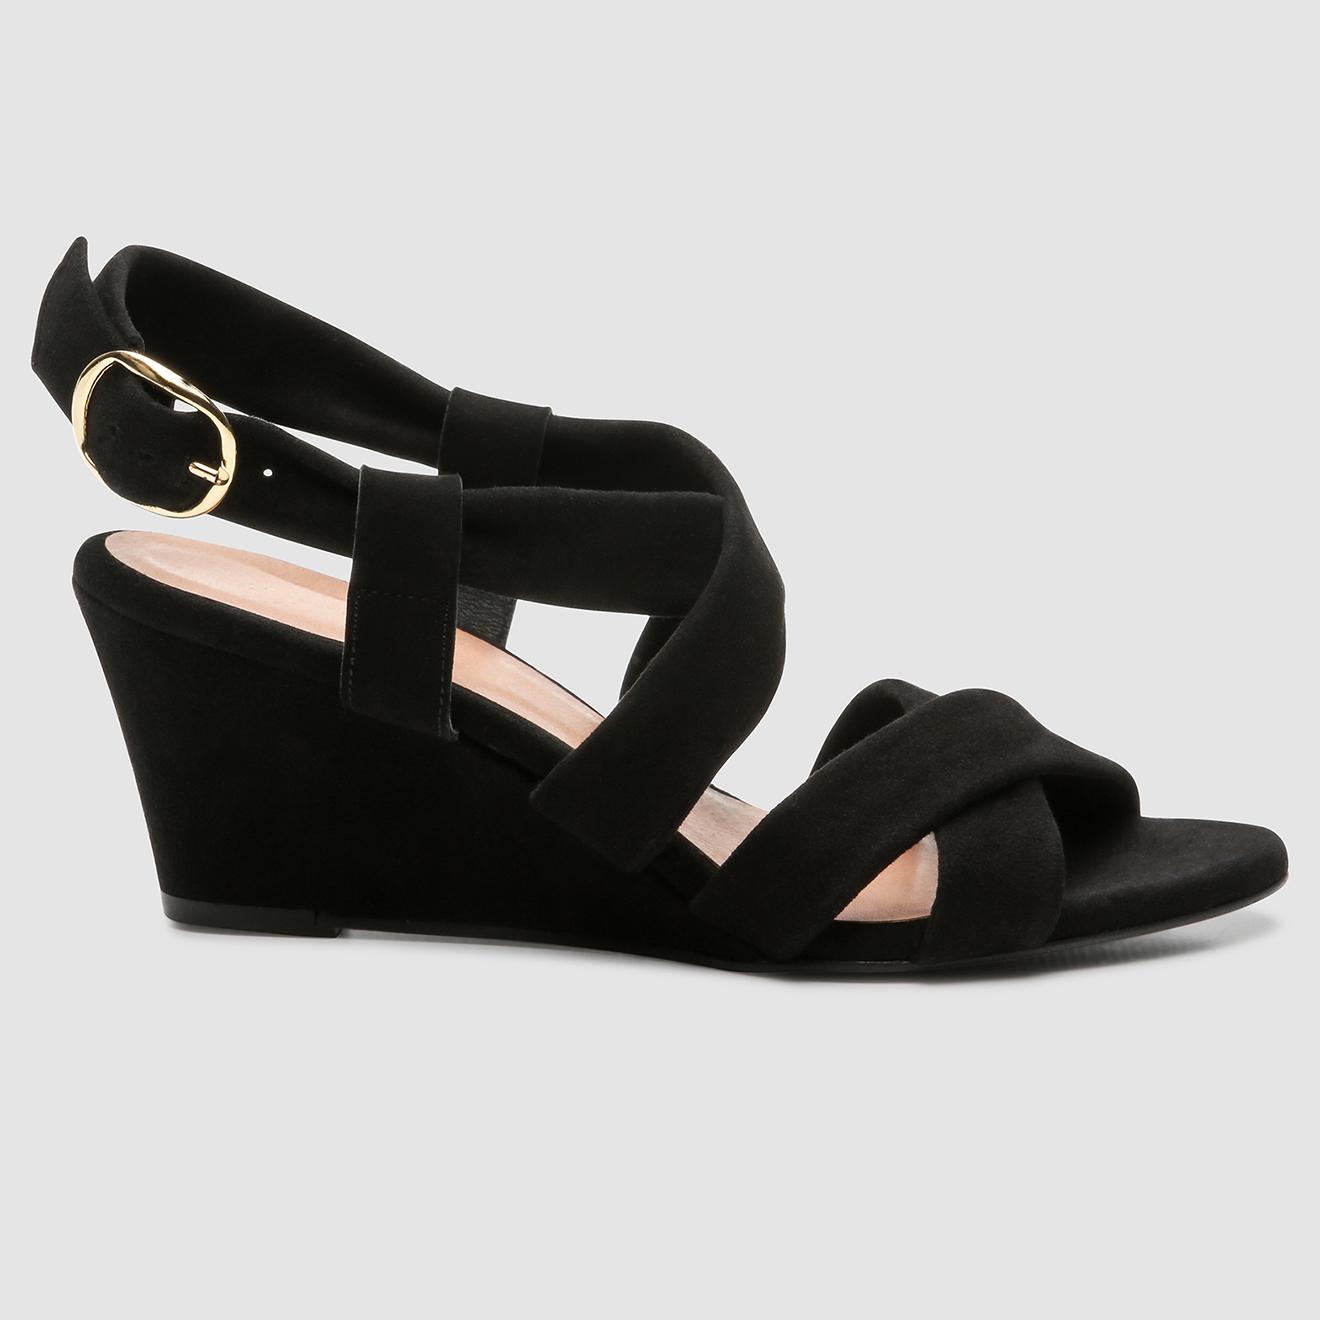 Sandales compensées en Velours de Cuir Valiya noires - Talon 6 cm - Cosmoparis - Modalova